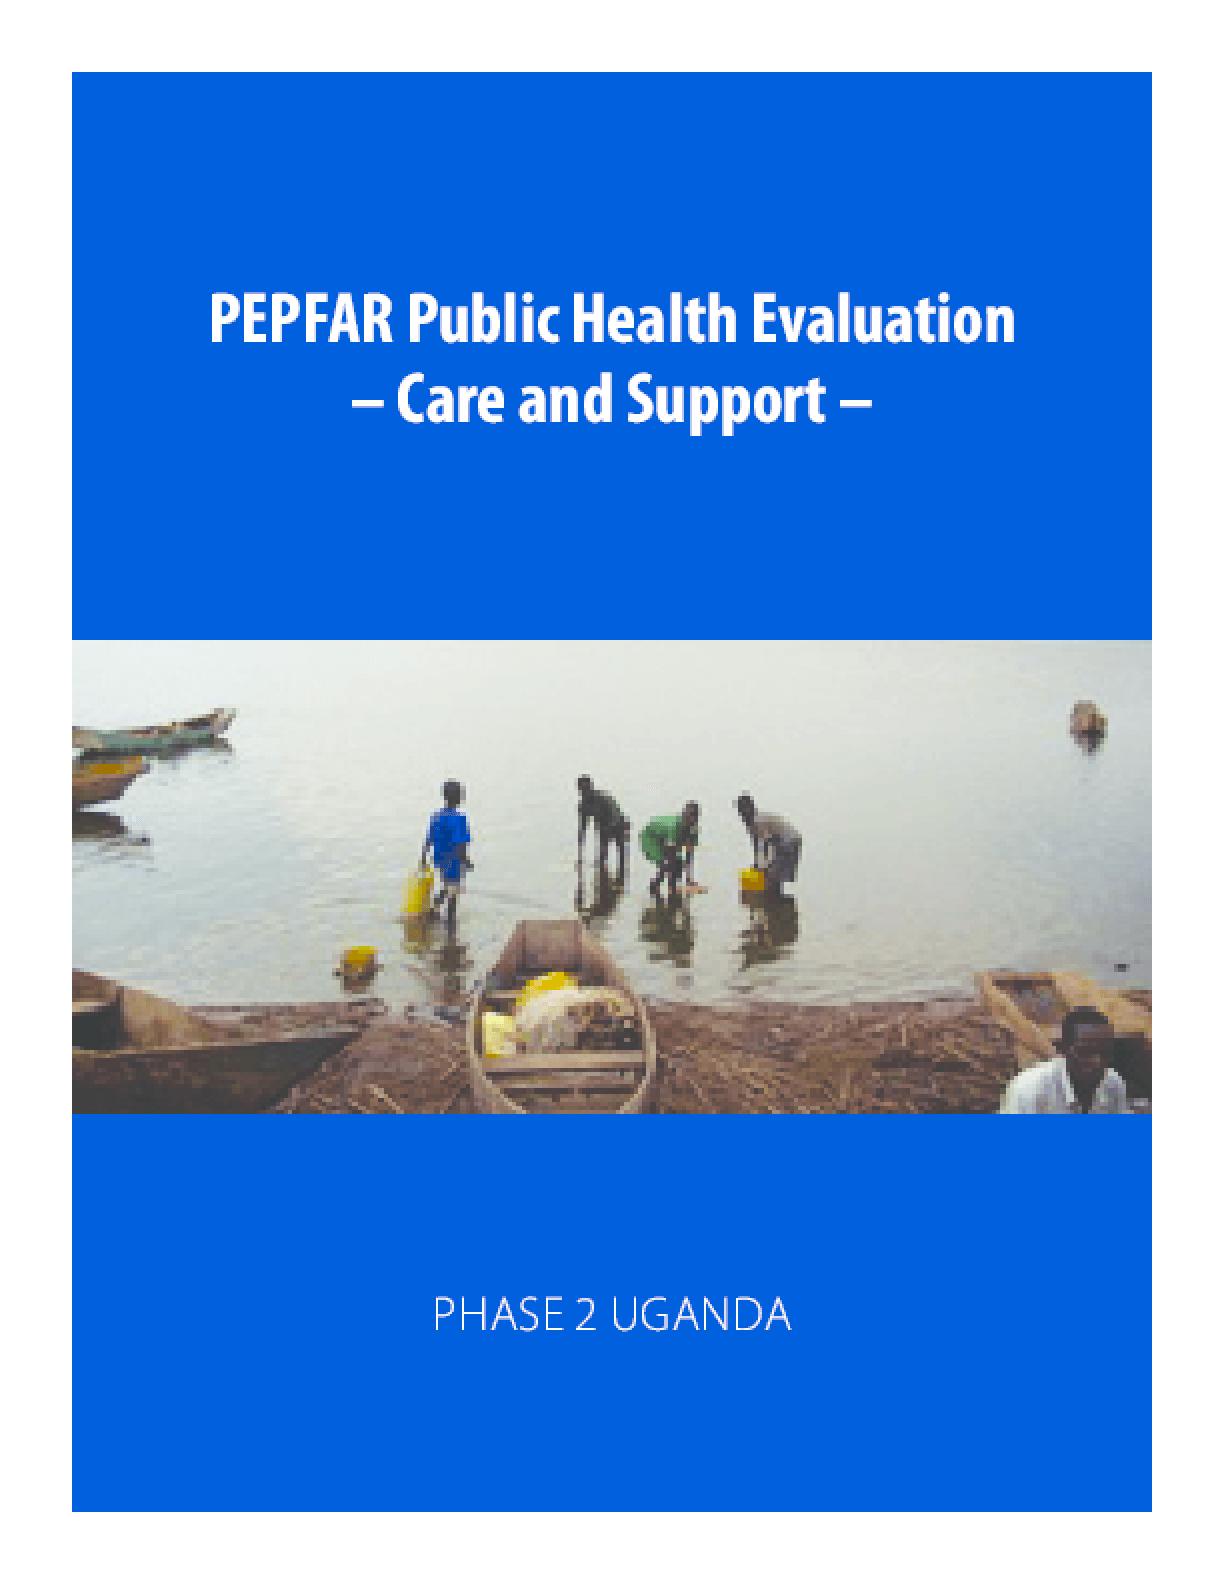 PEPFAR Public Health Evaluation - Care and Support - Phase 2 Uganda